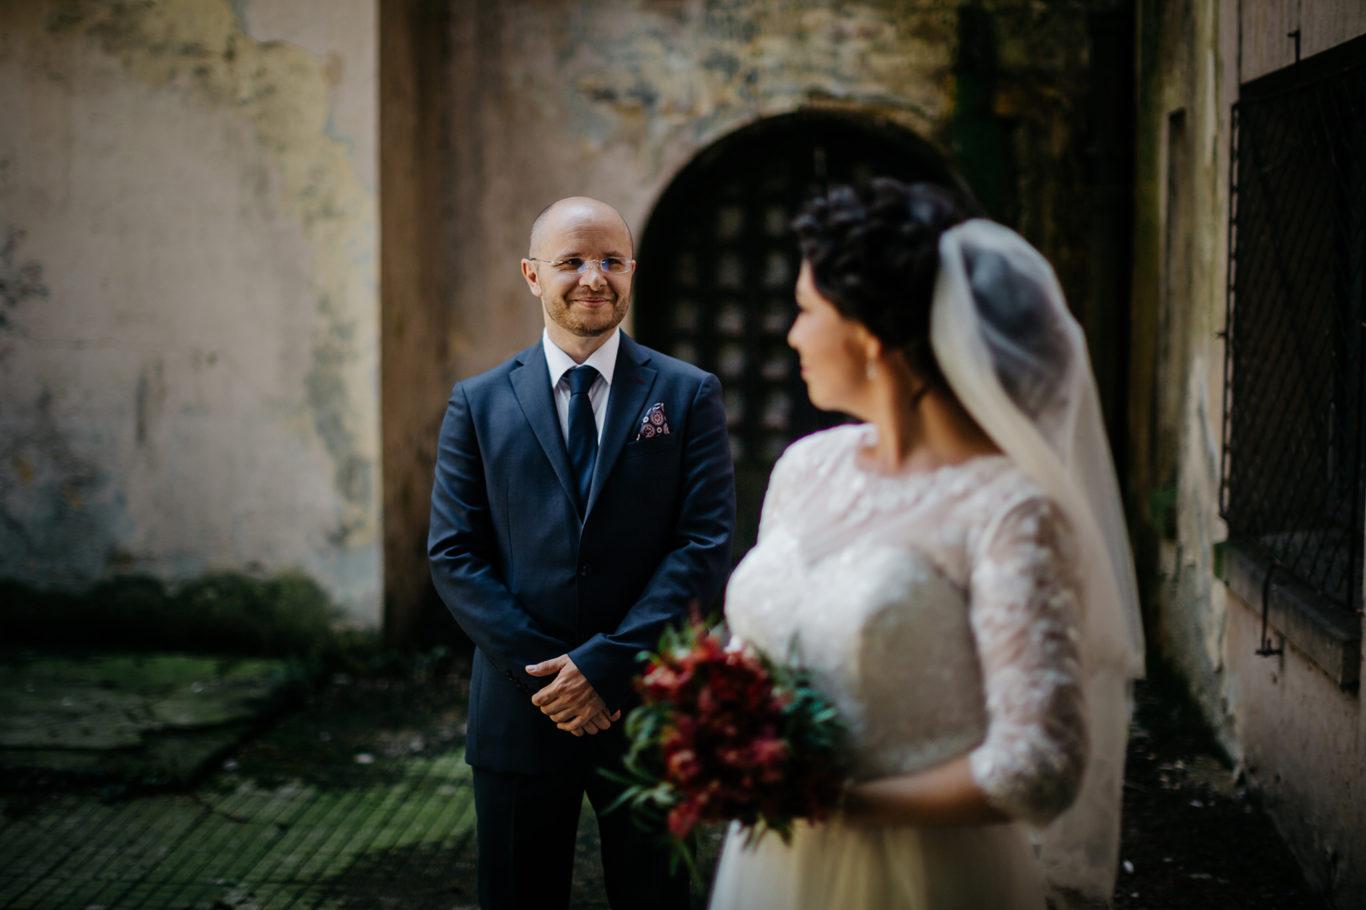 0340-fotografie-nunta-bucuresti-anca-george-fotograf-ciprian-dumitrescu-dcf_4739